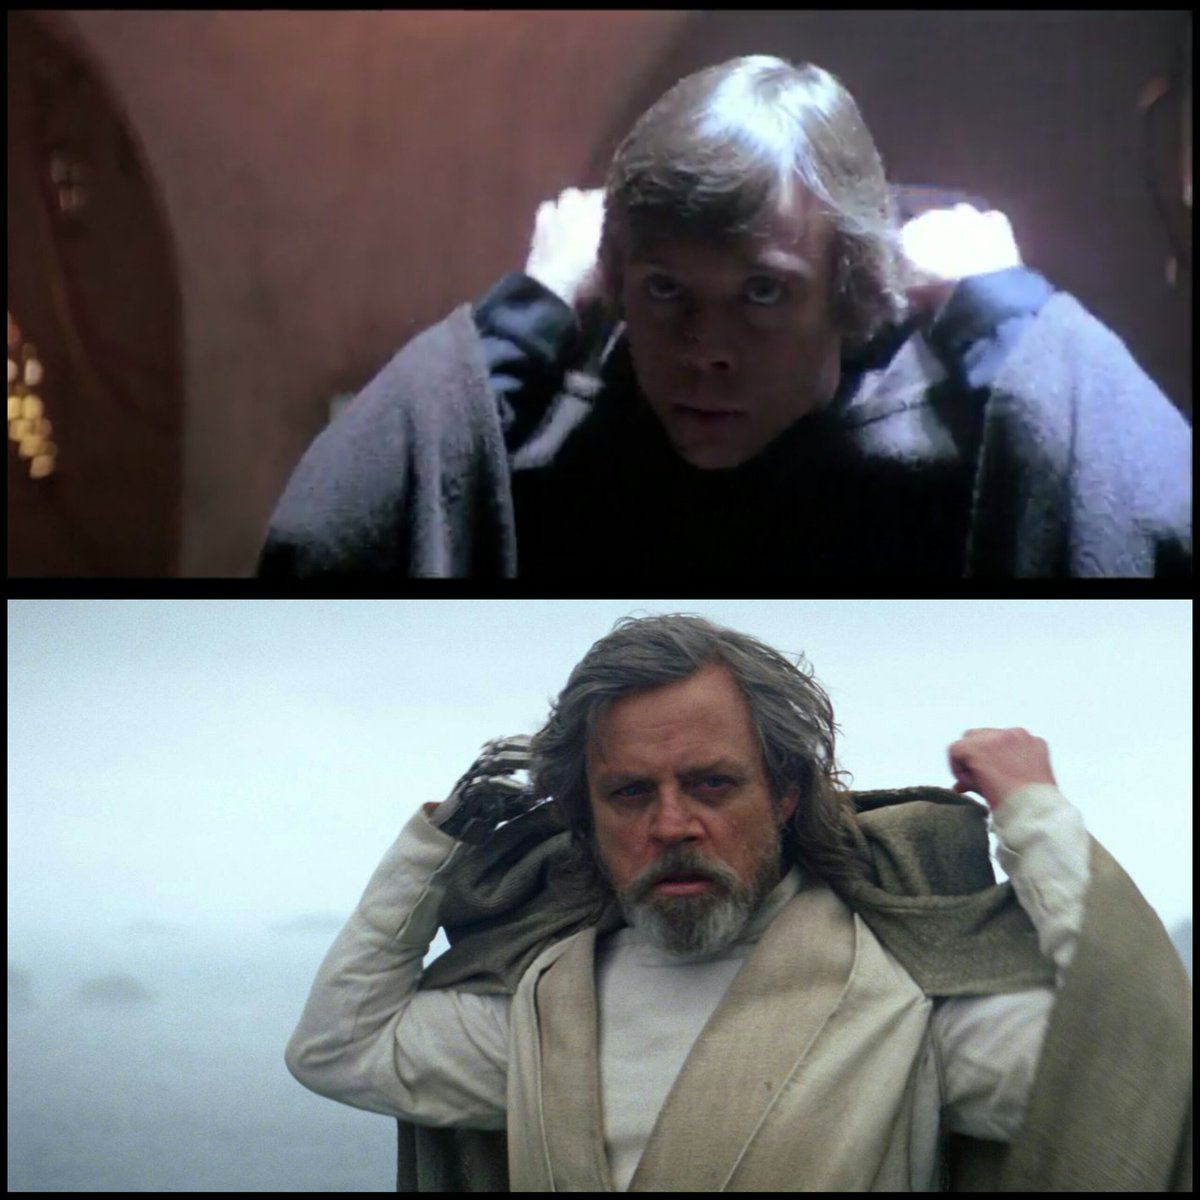 Once a Jedi, always a Jedi. #Luke #starwars<br>http://pic.twitter.com/wVQjneWL2h